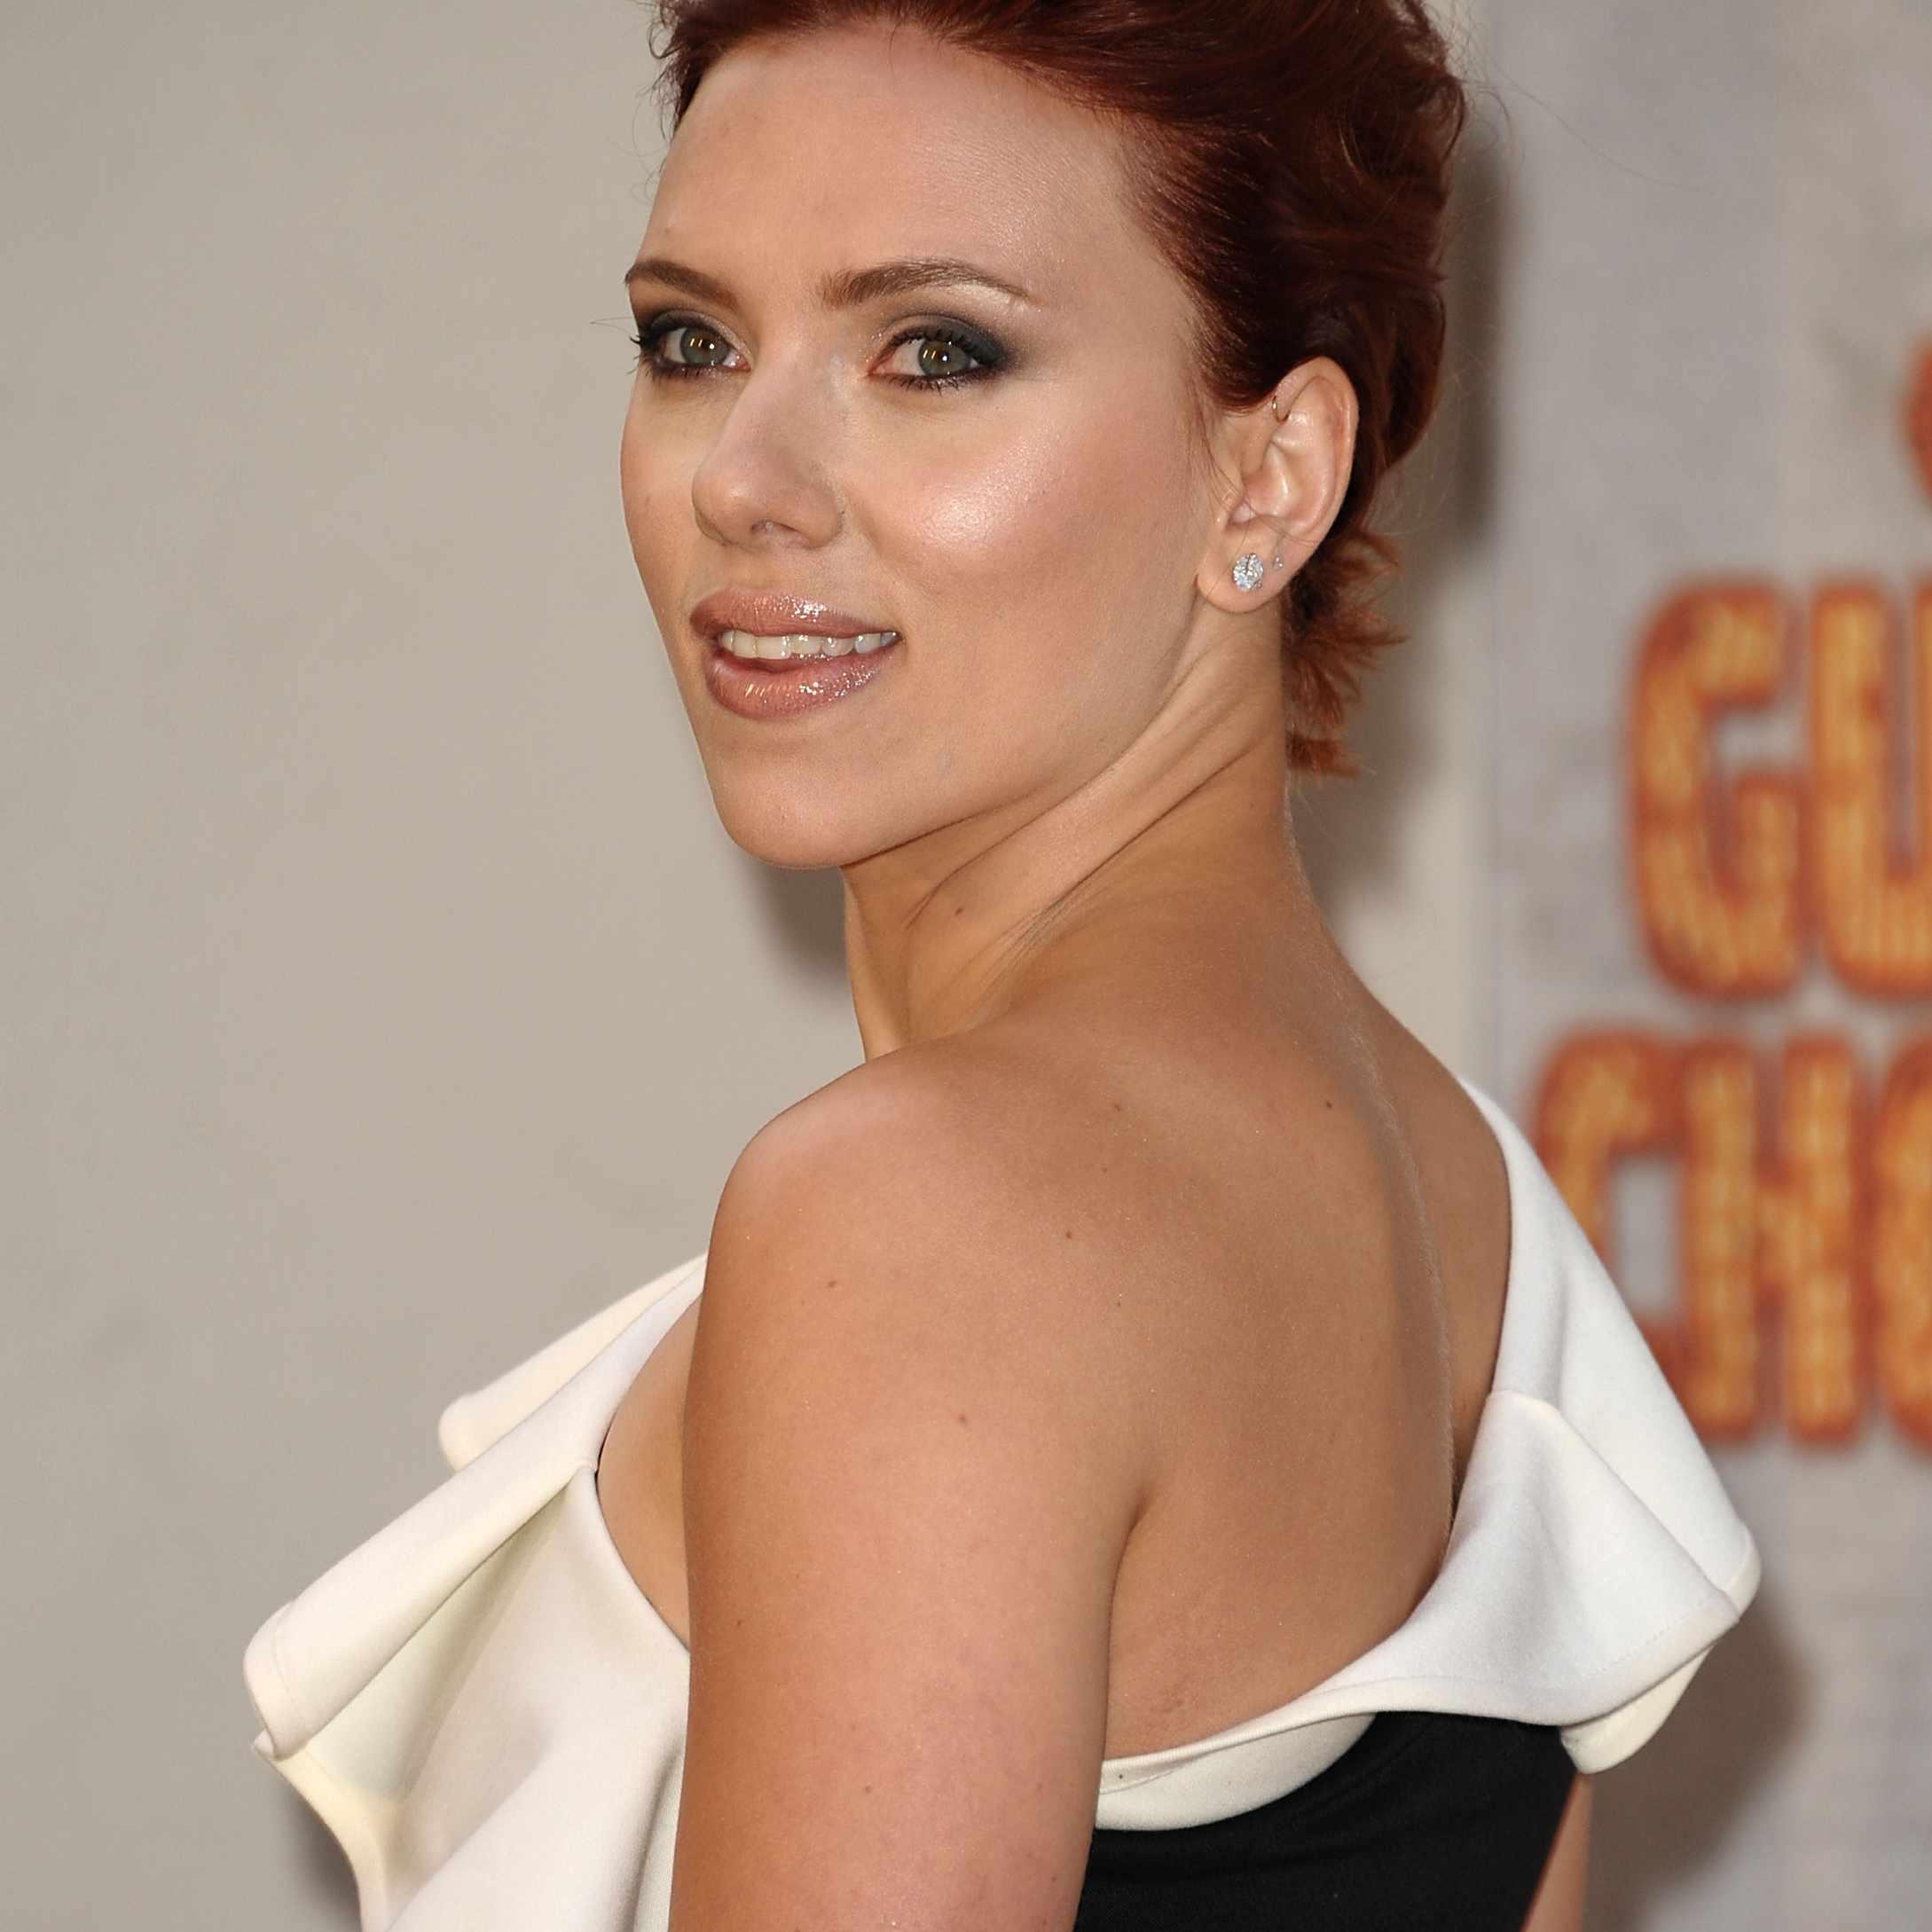 Red Hair-Scarlett Johansson